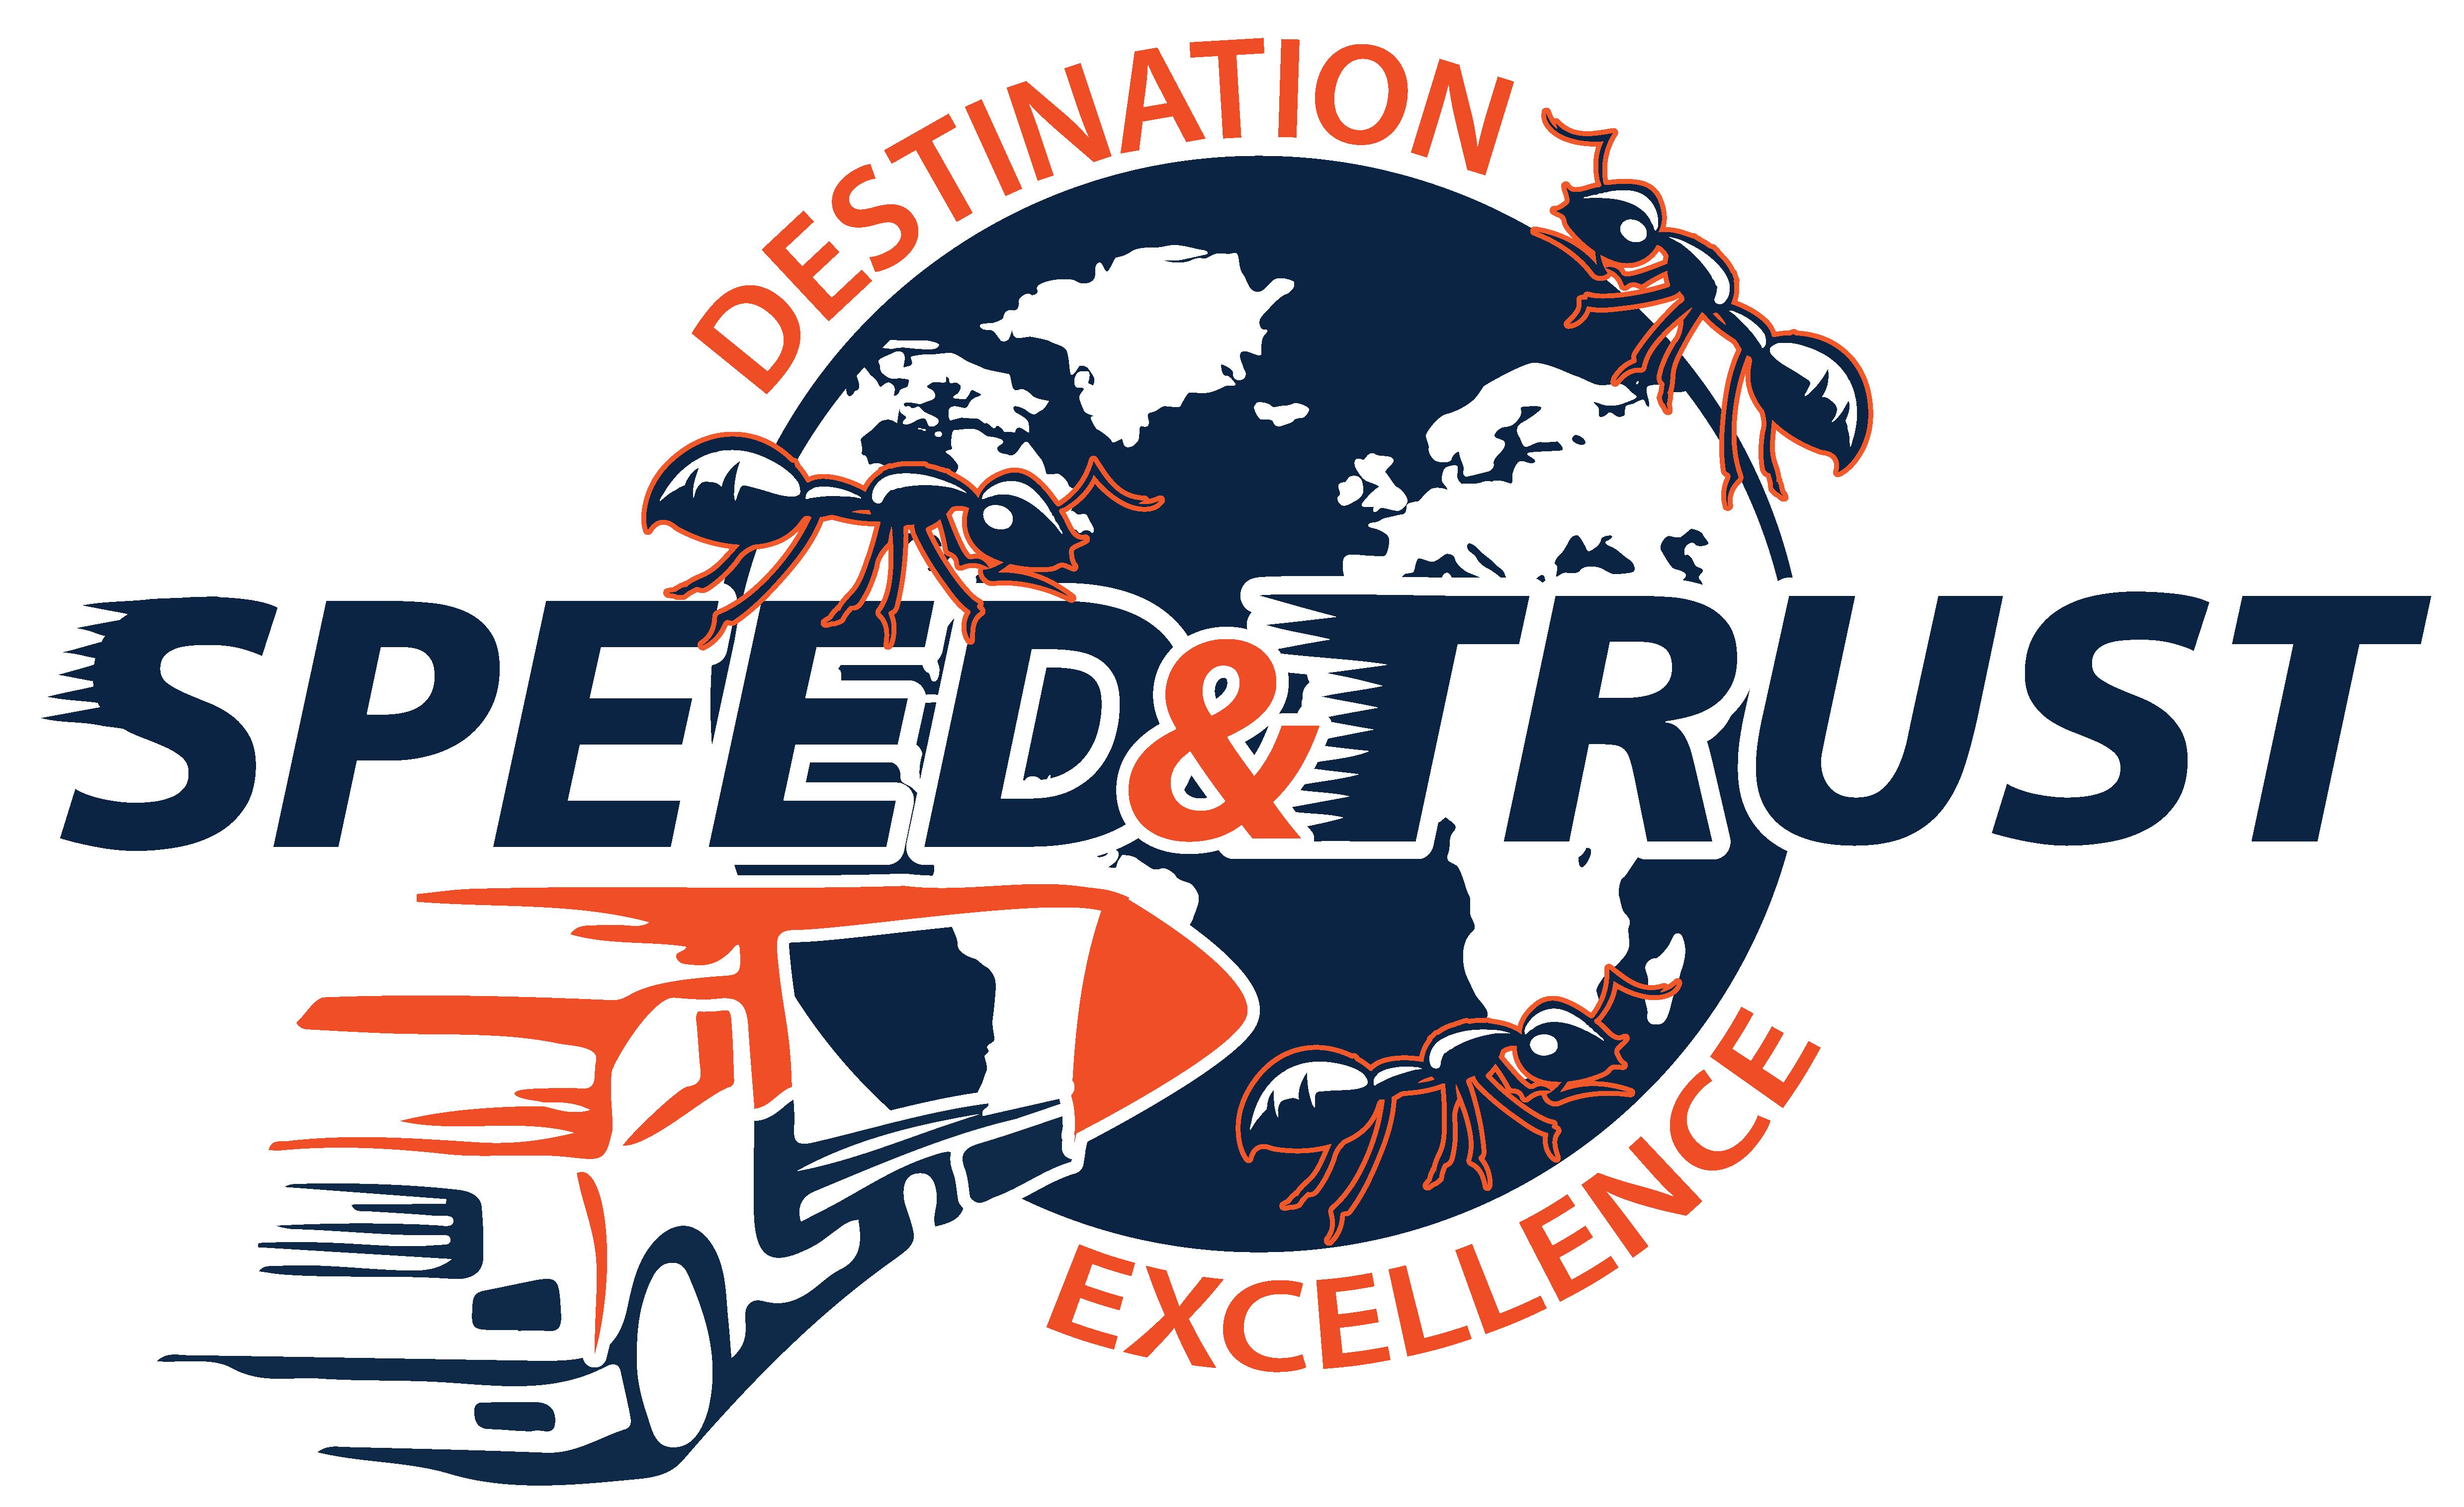 Speed & Trust